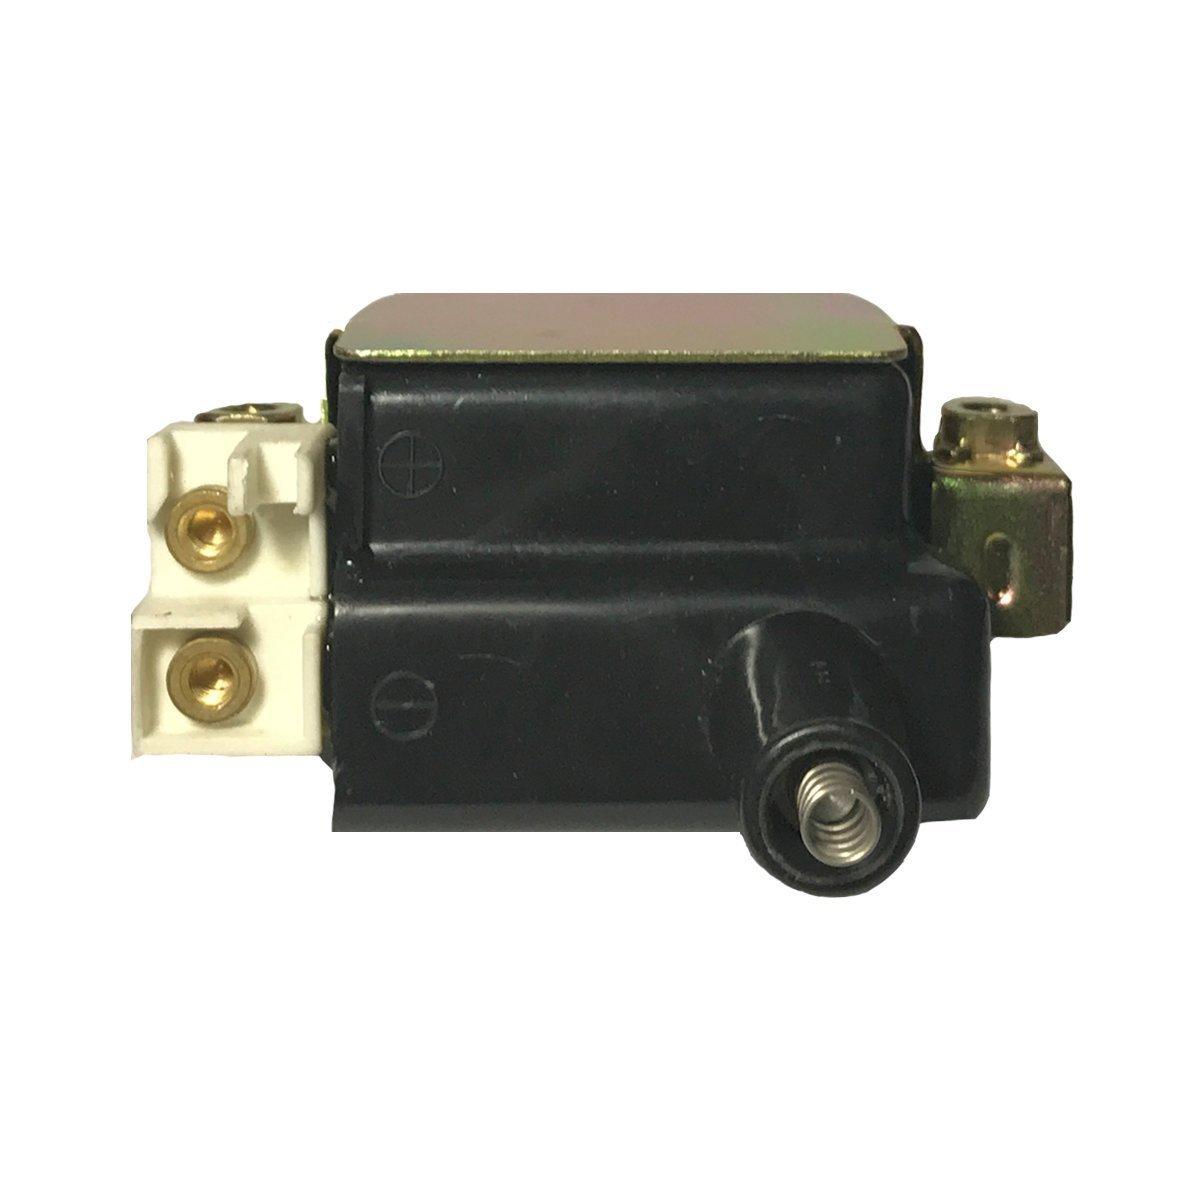 Ignition Coil 30500-PAA-A01 Replaces# 30510-PT2-006 Accord Integra 2.2L 1.8L 2.3L 1.6L 30510-p73-a01 Fits Acura /& Honda Civic